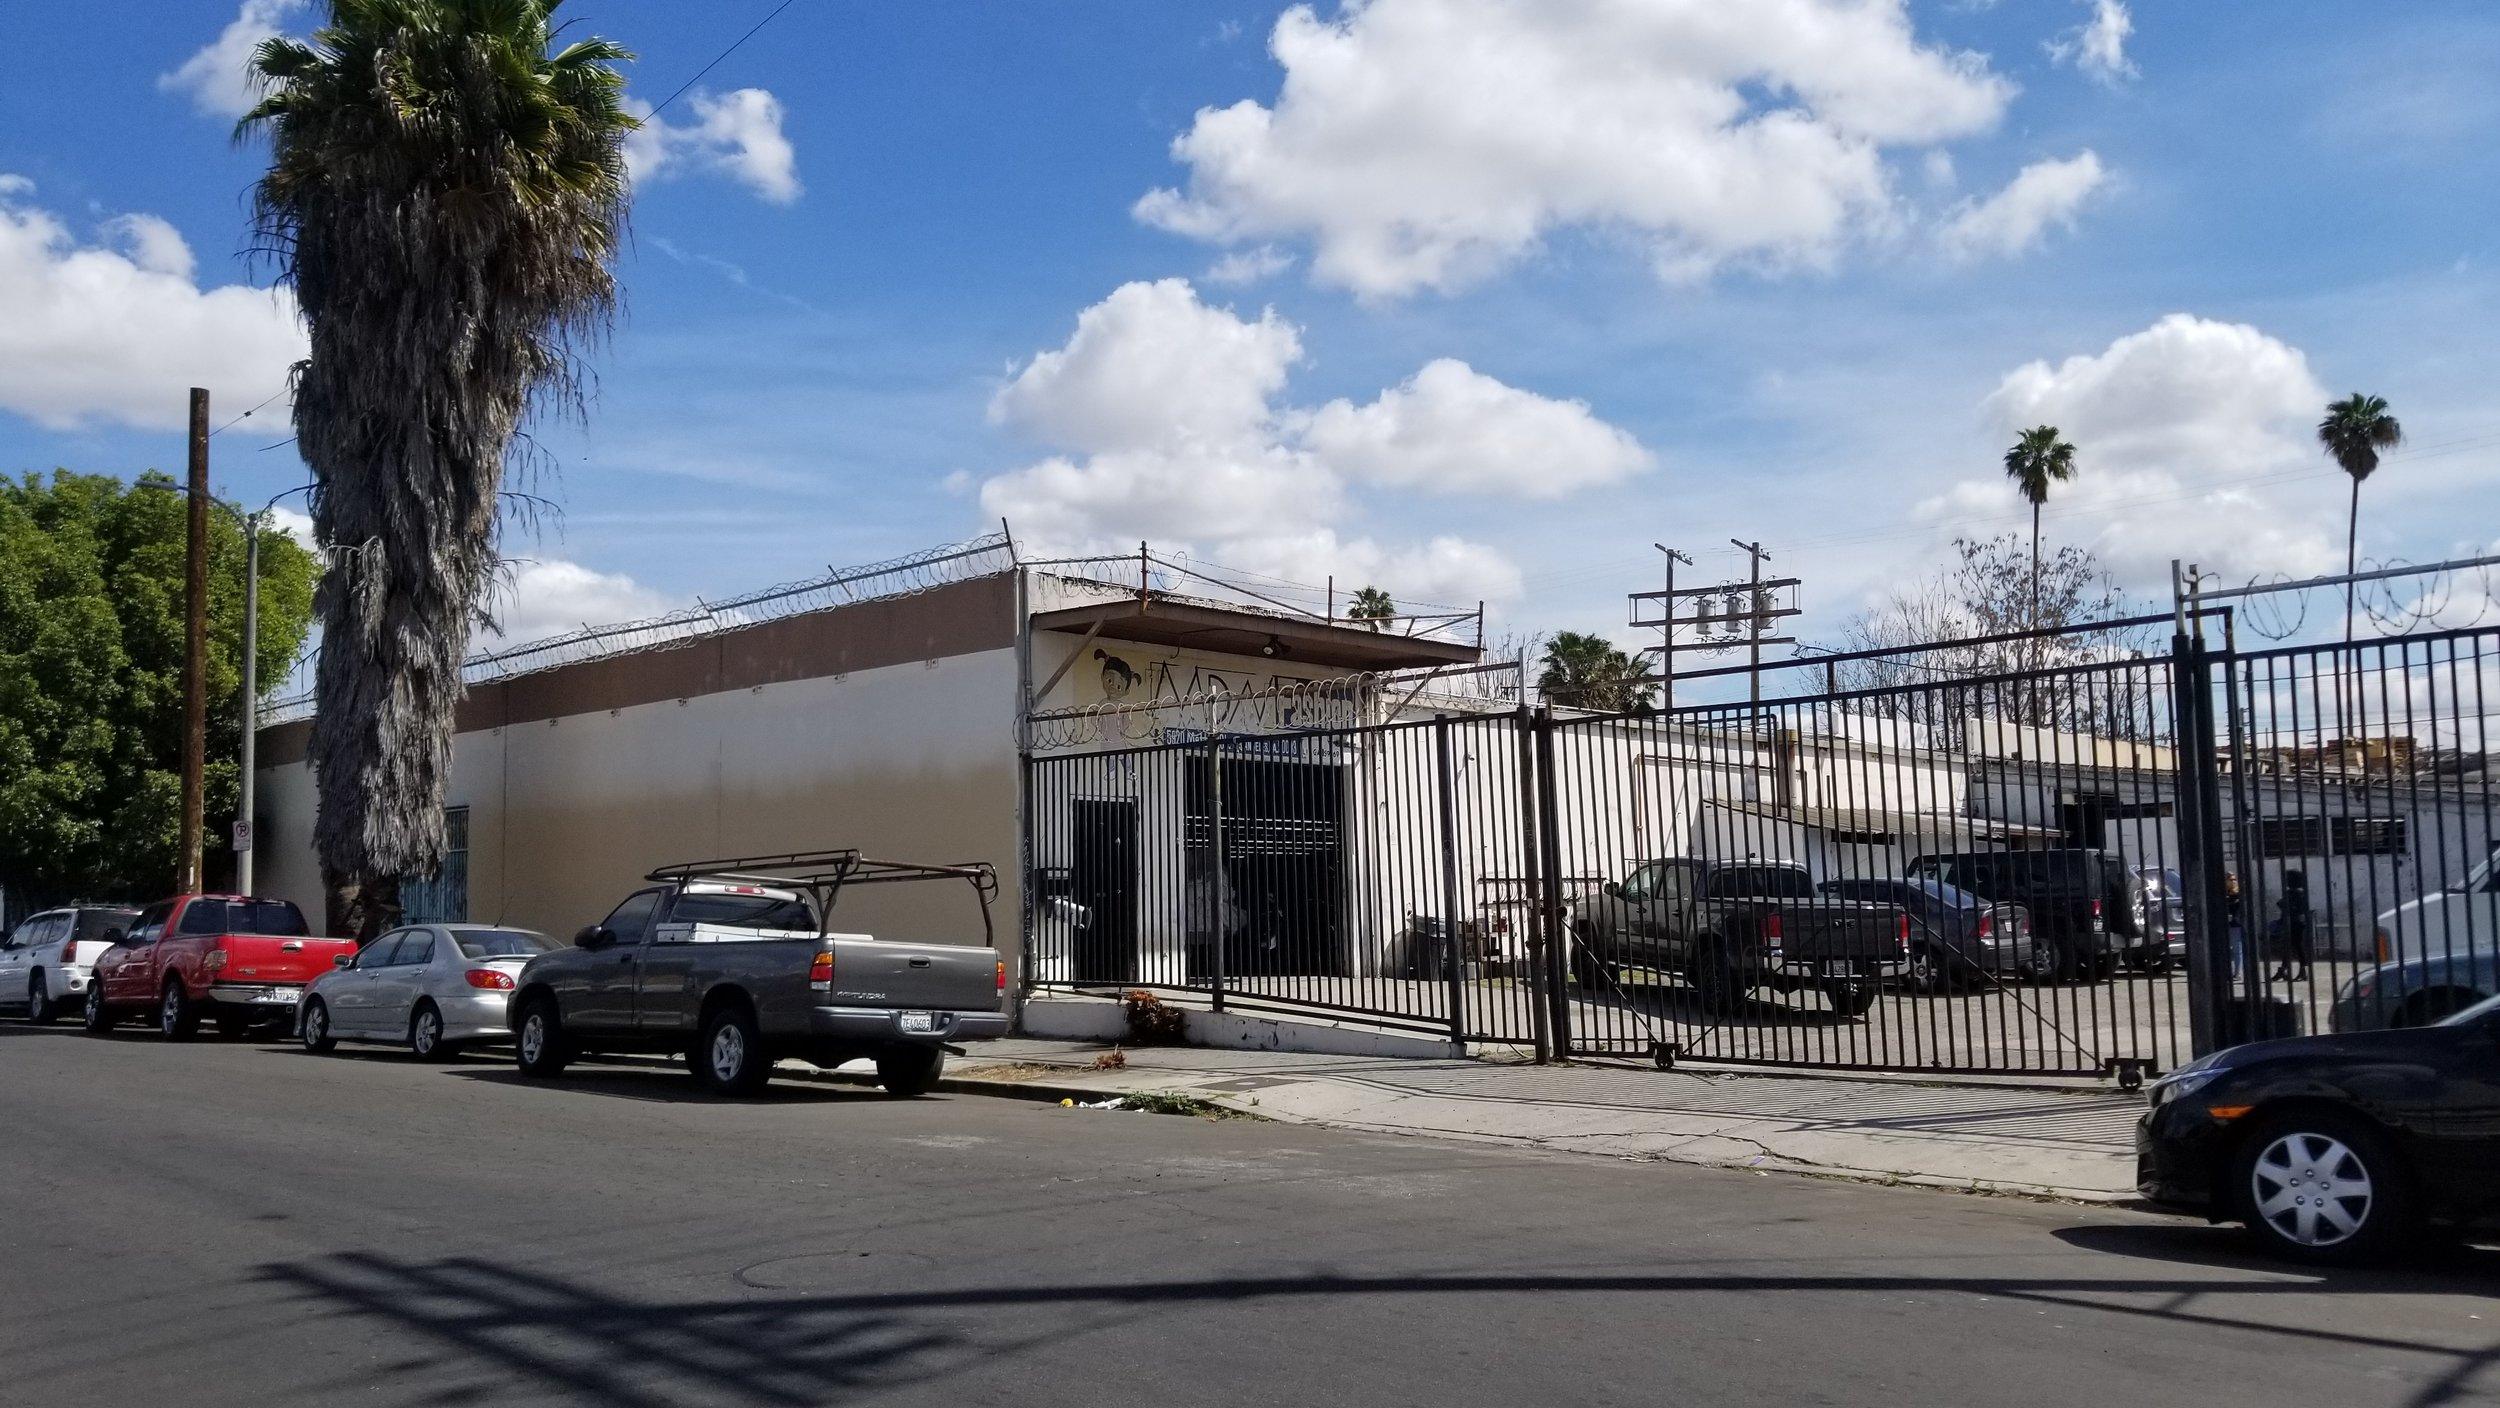 5914 mettler street, los angeles, ca 90003 - - Asking Price: $3,000,000- Property Type: Industrial- Building: 15,000 SF- Land: 22,216 SF